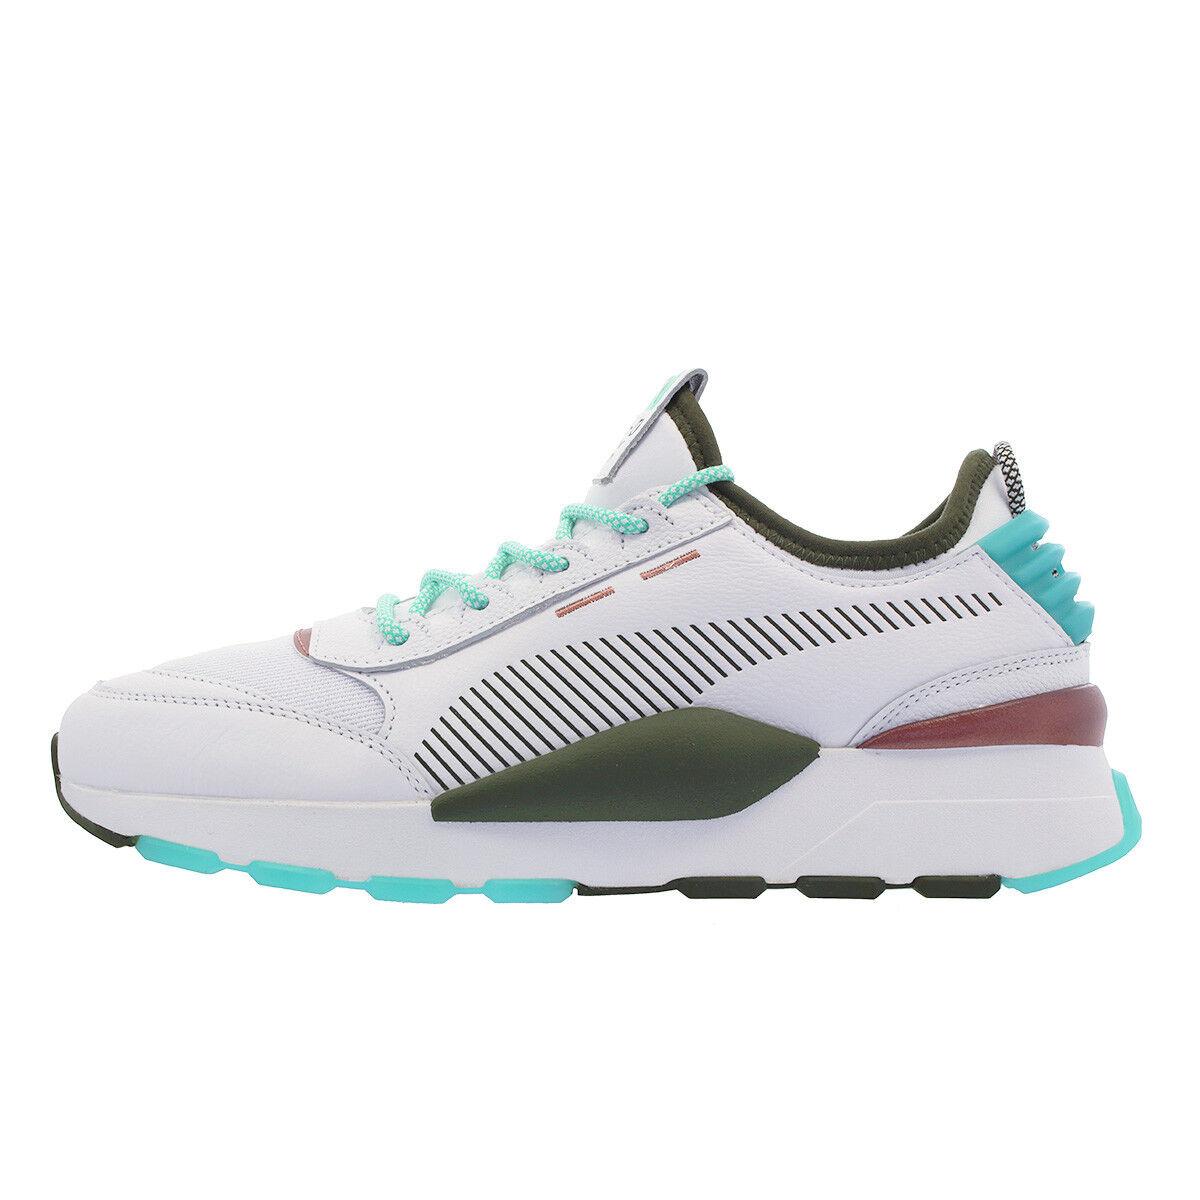 Puma Men's RS-0 x EMORY JONES shoes Puma White Biscay Green 368053-01 c